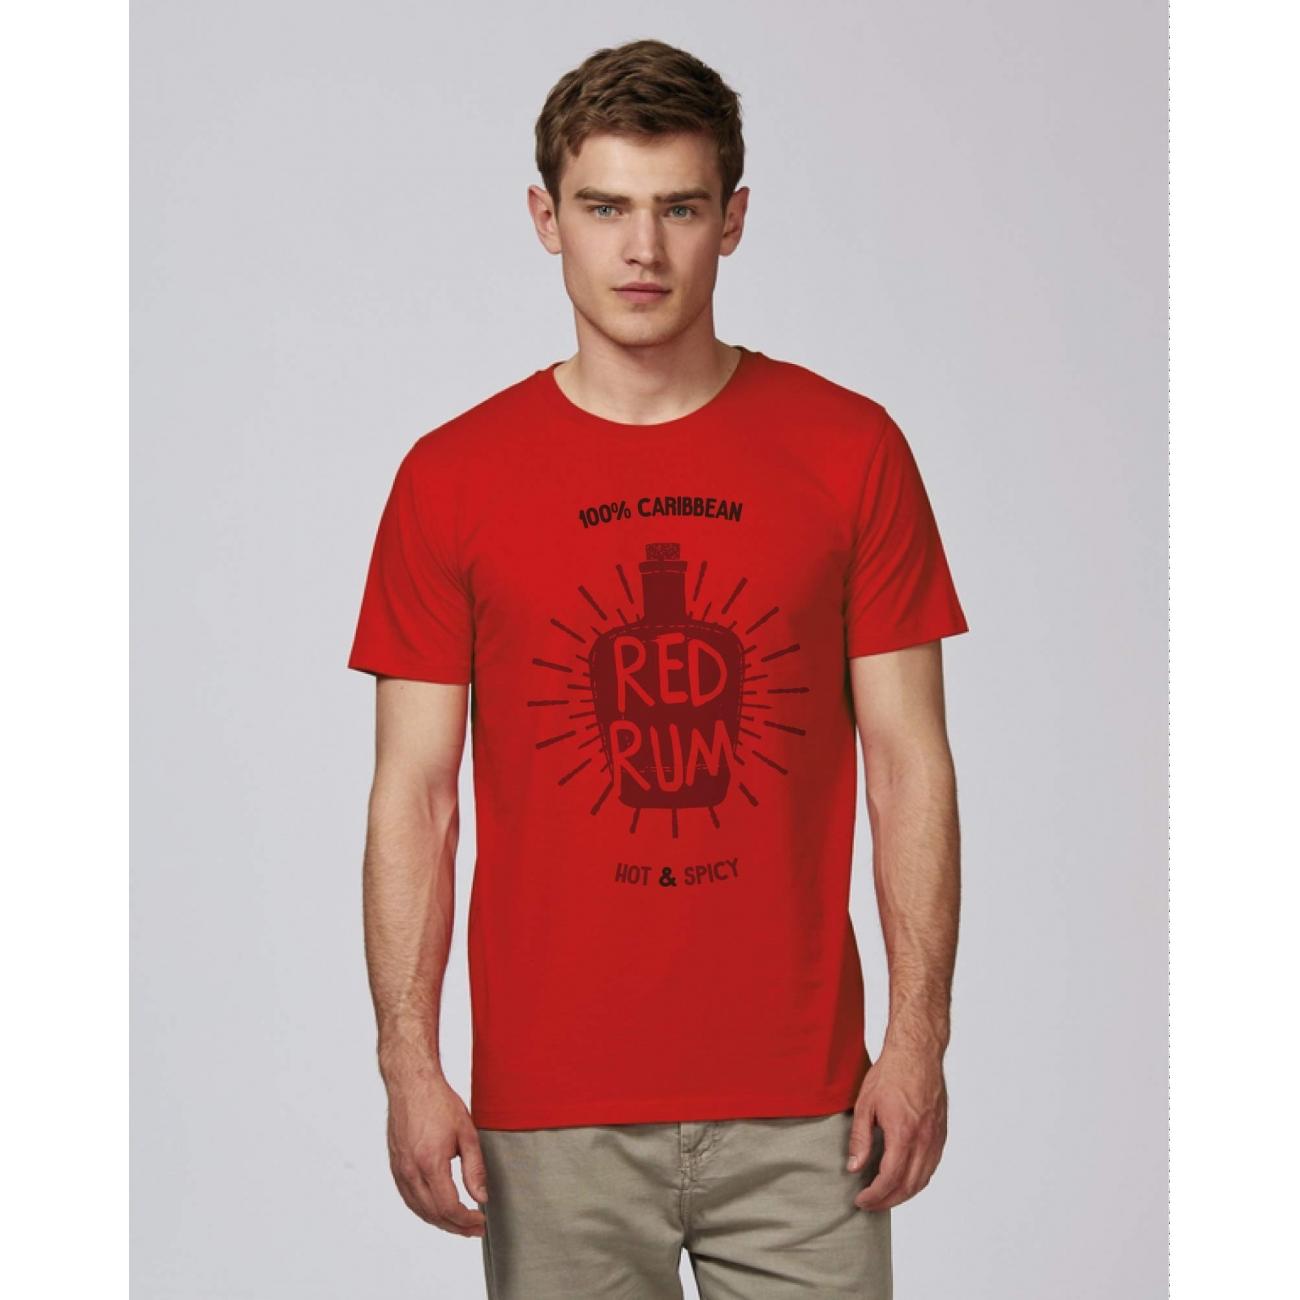 https://tee-shirt-bio.com/6209-thickbox_default/tee-shirt-coton-bio-rouge-homme-tee-shirt-rhum.jpg